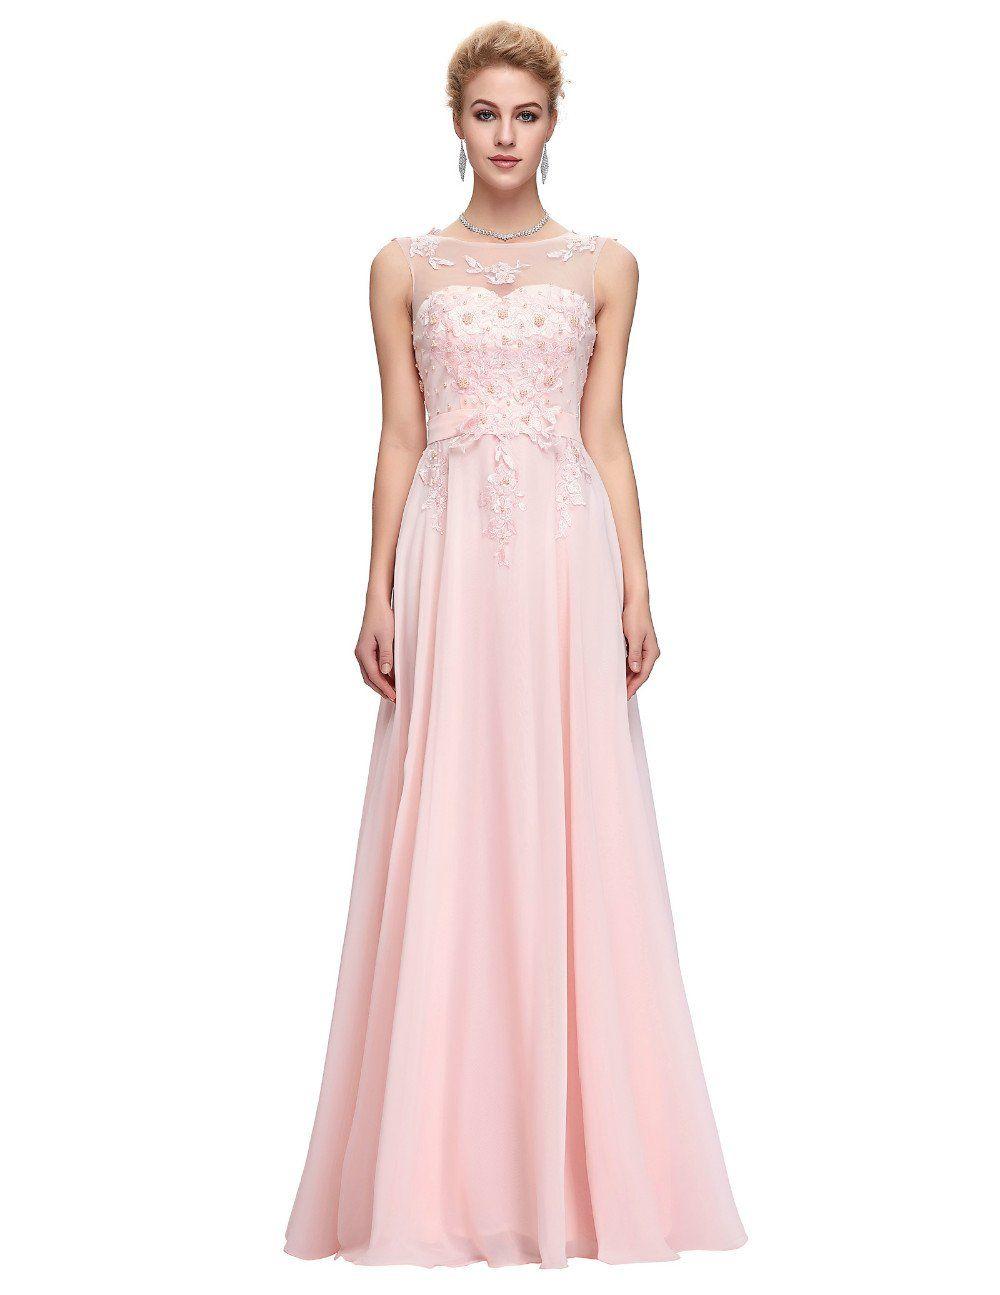 Long bridesmaid dresses sleeveless chiffon pink red royal blue black